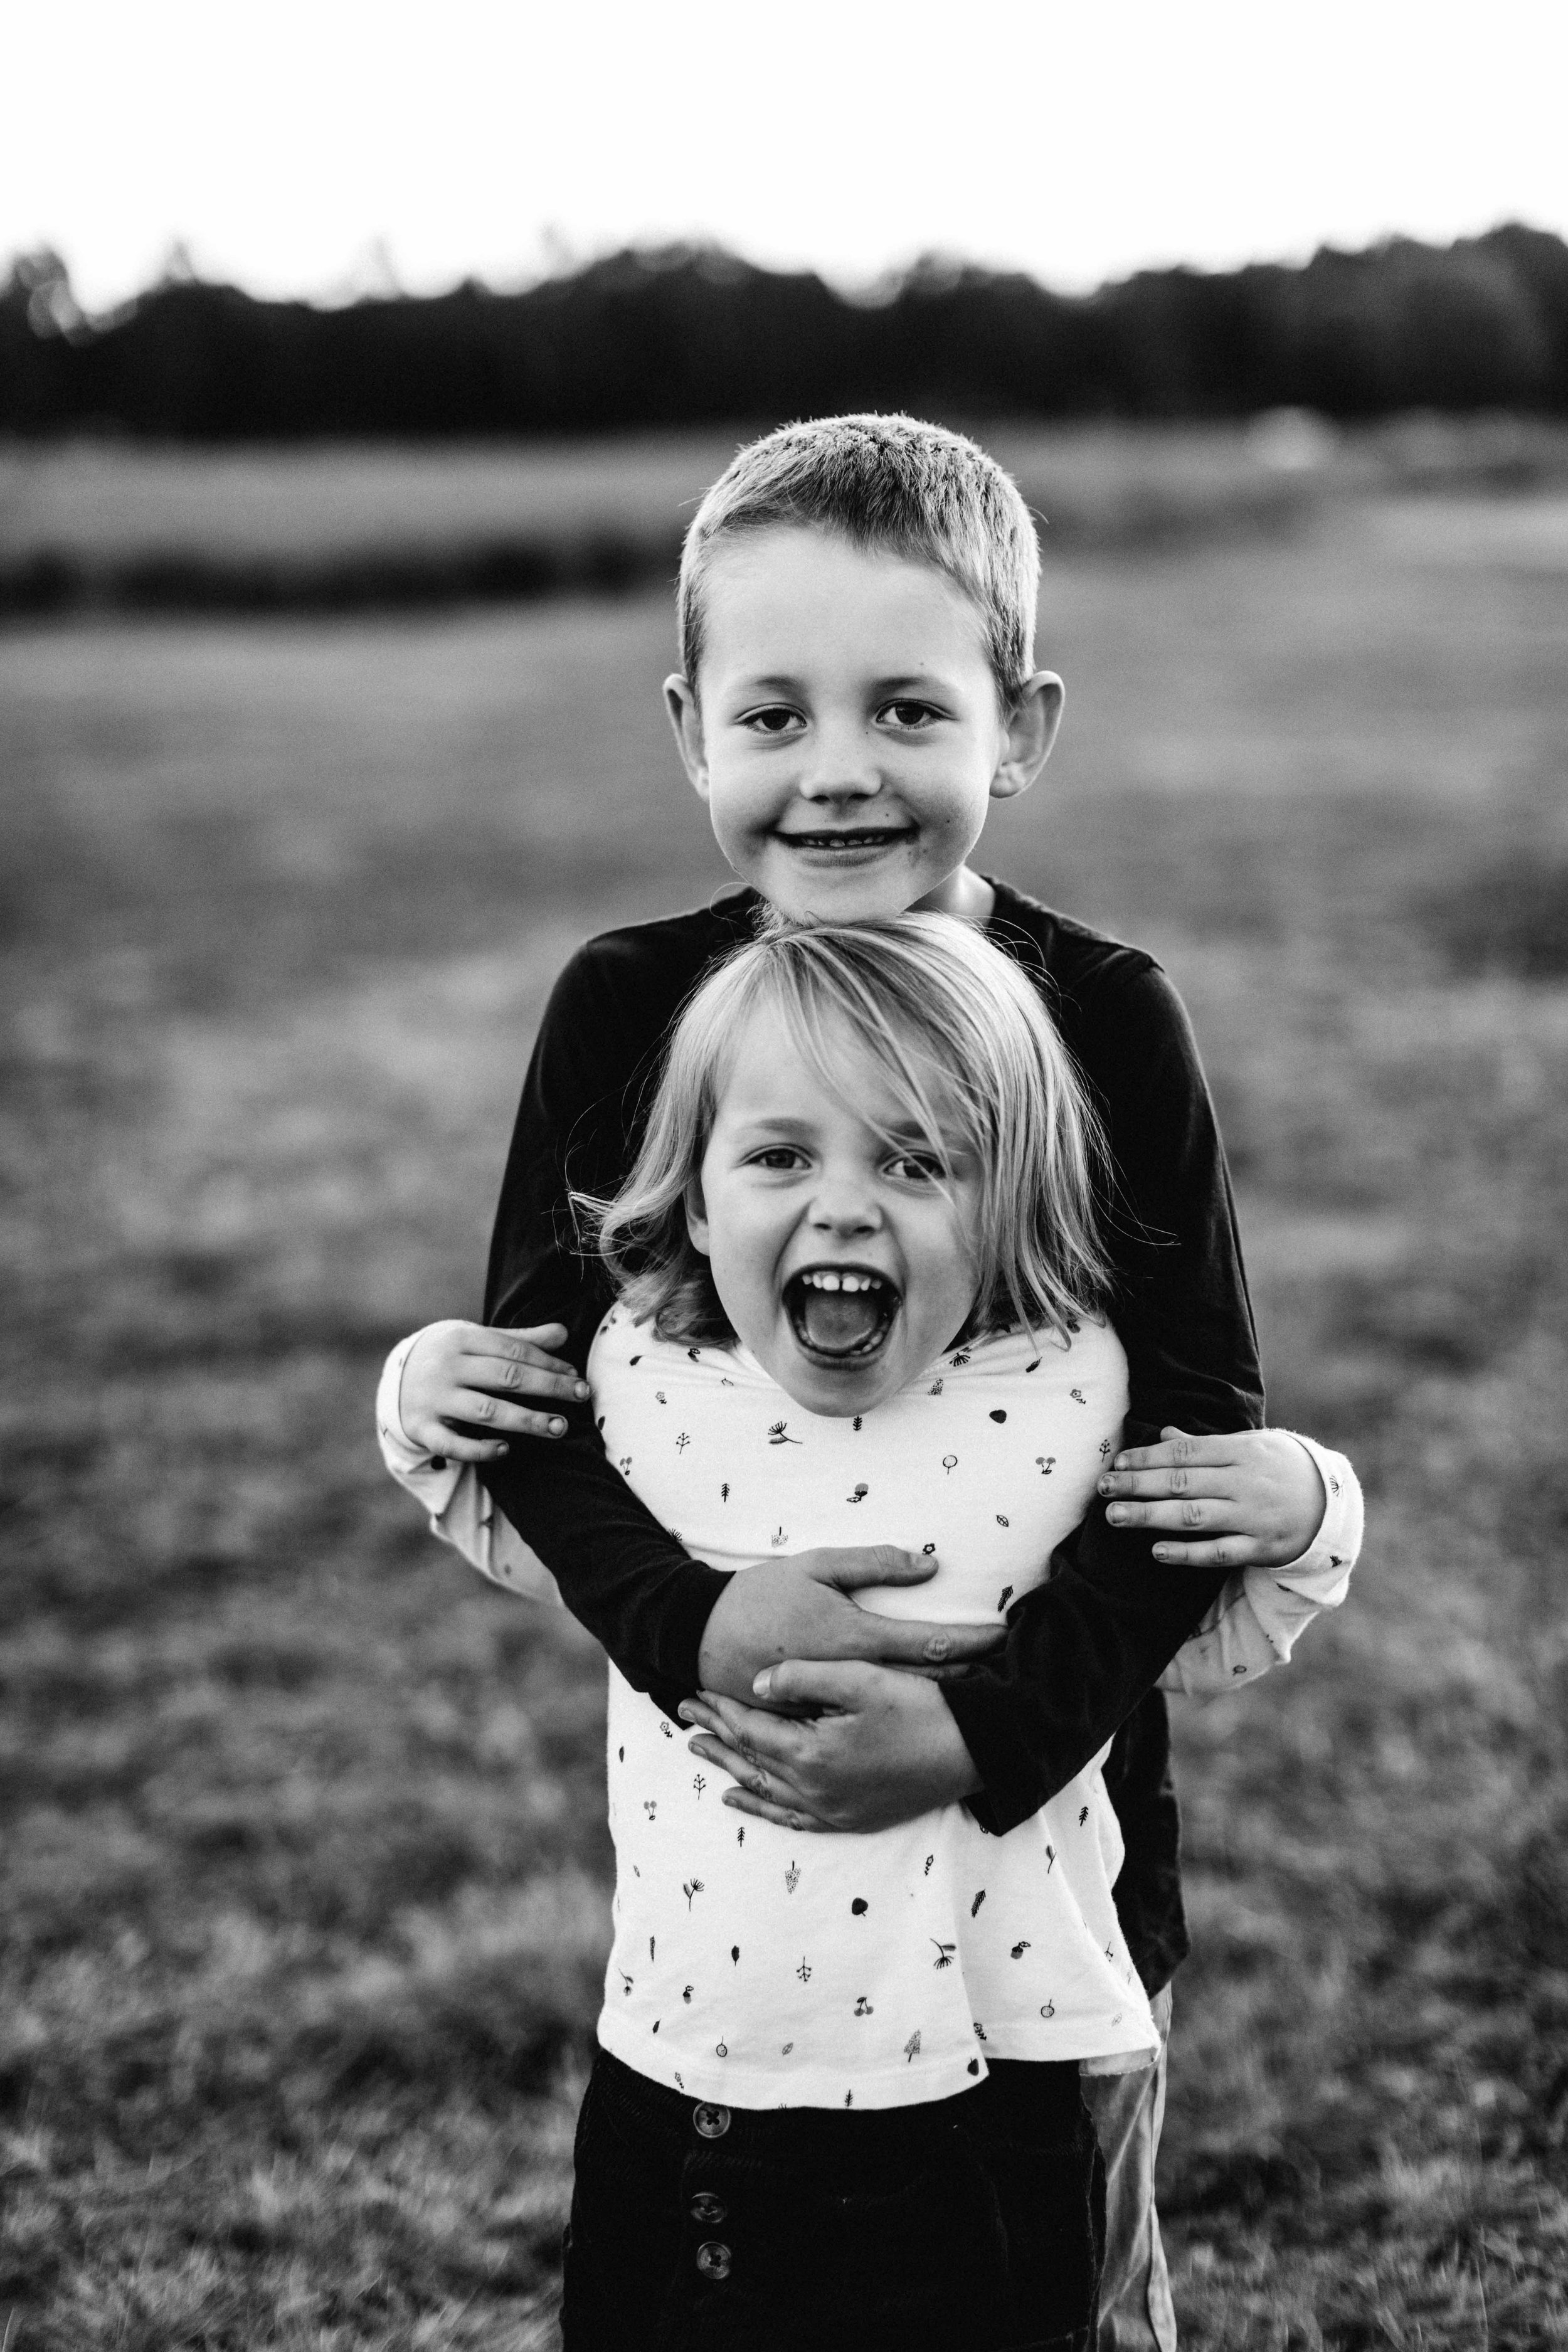 camden-family-photography-boot-family-session-44.jpg